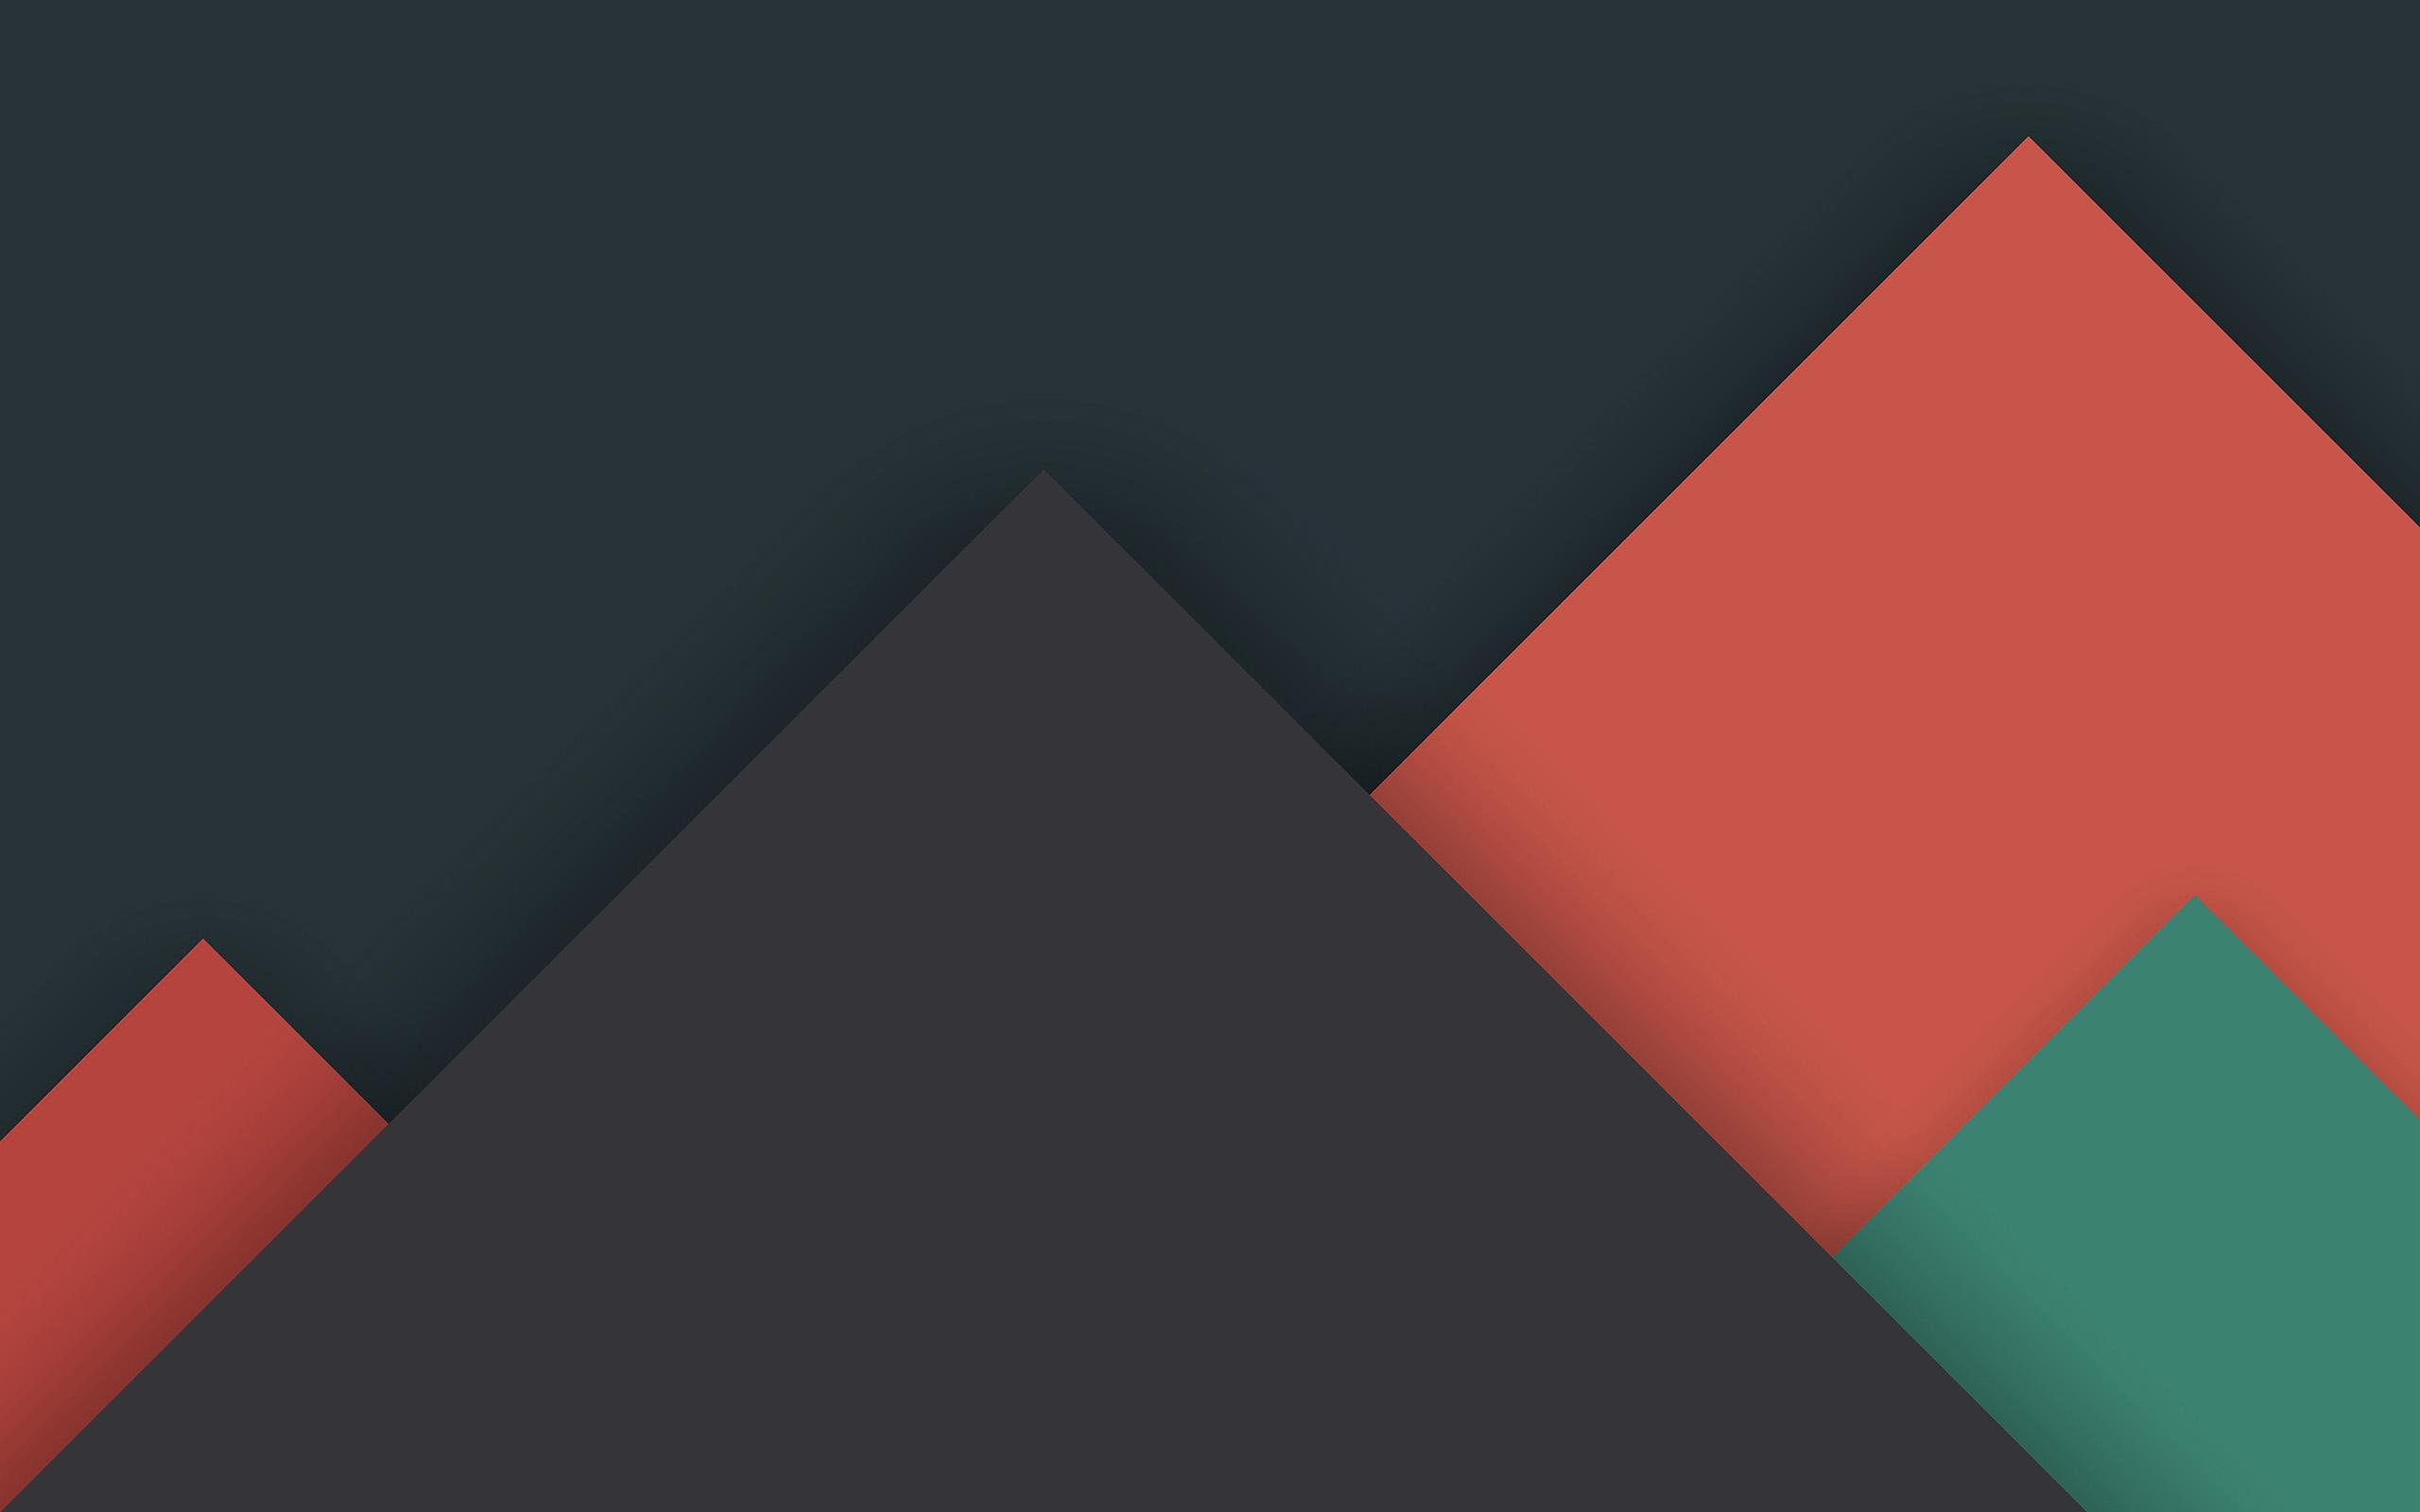 Vk55-android-lollipop-material-design-pattern-wallpaper